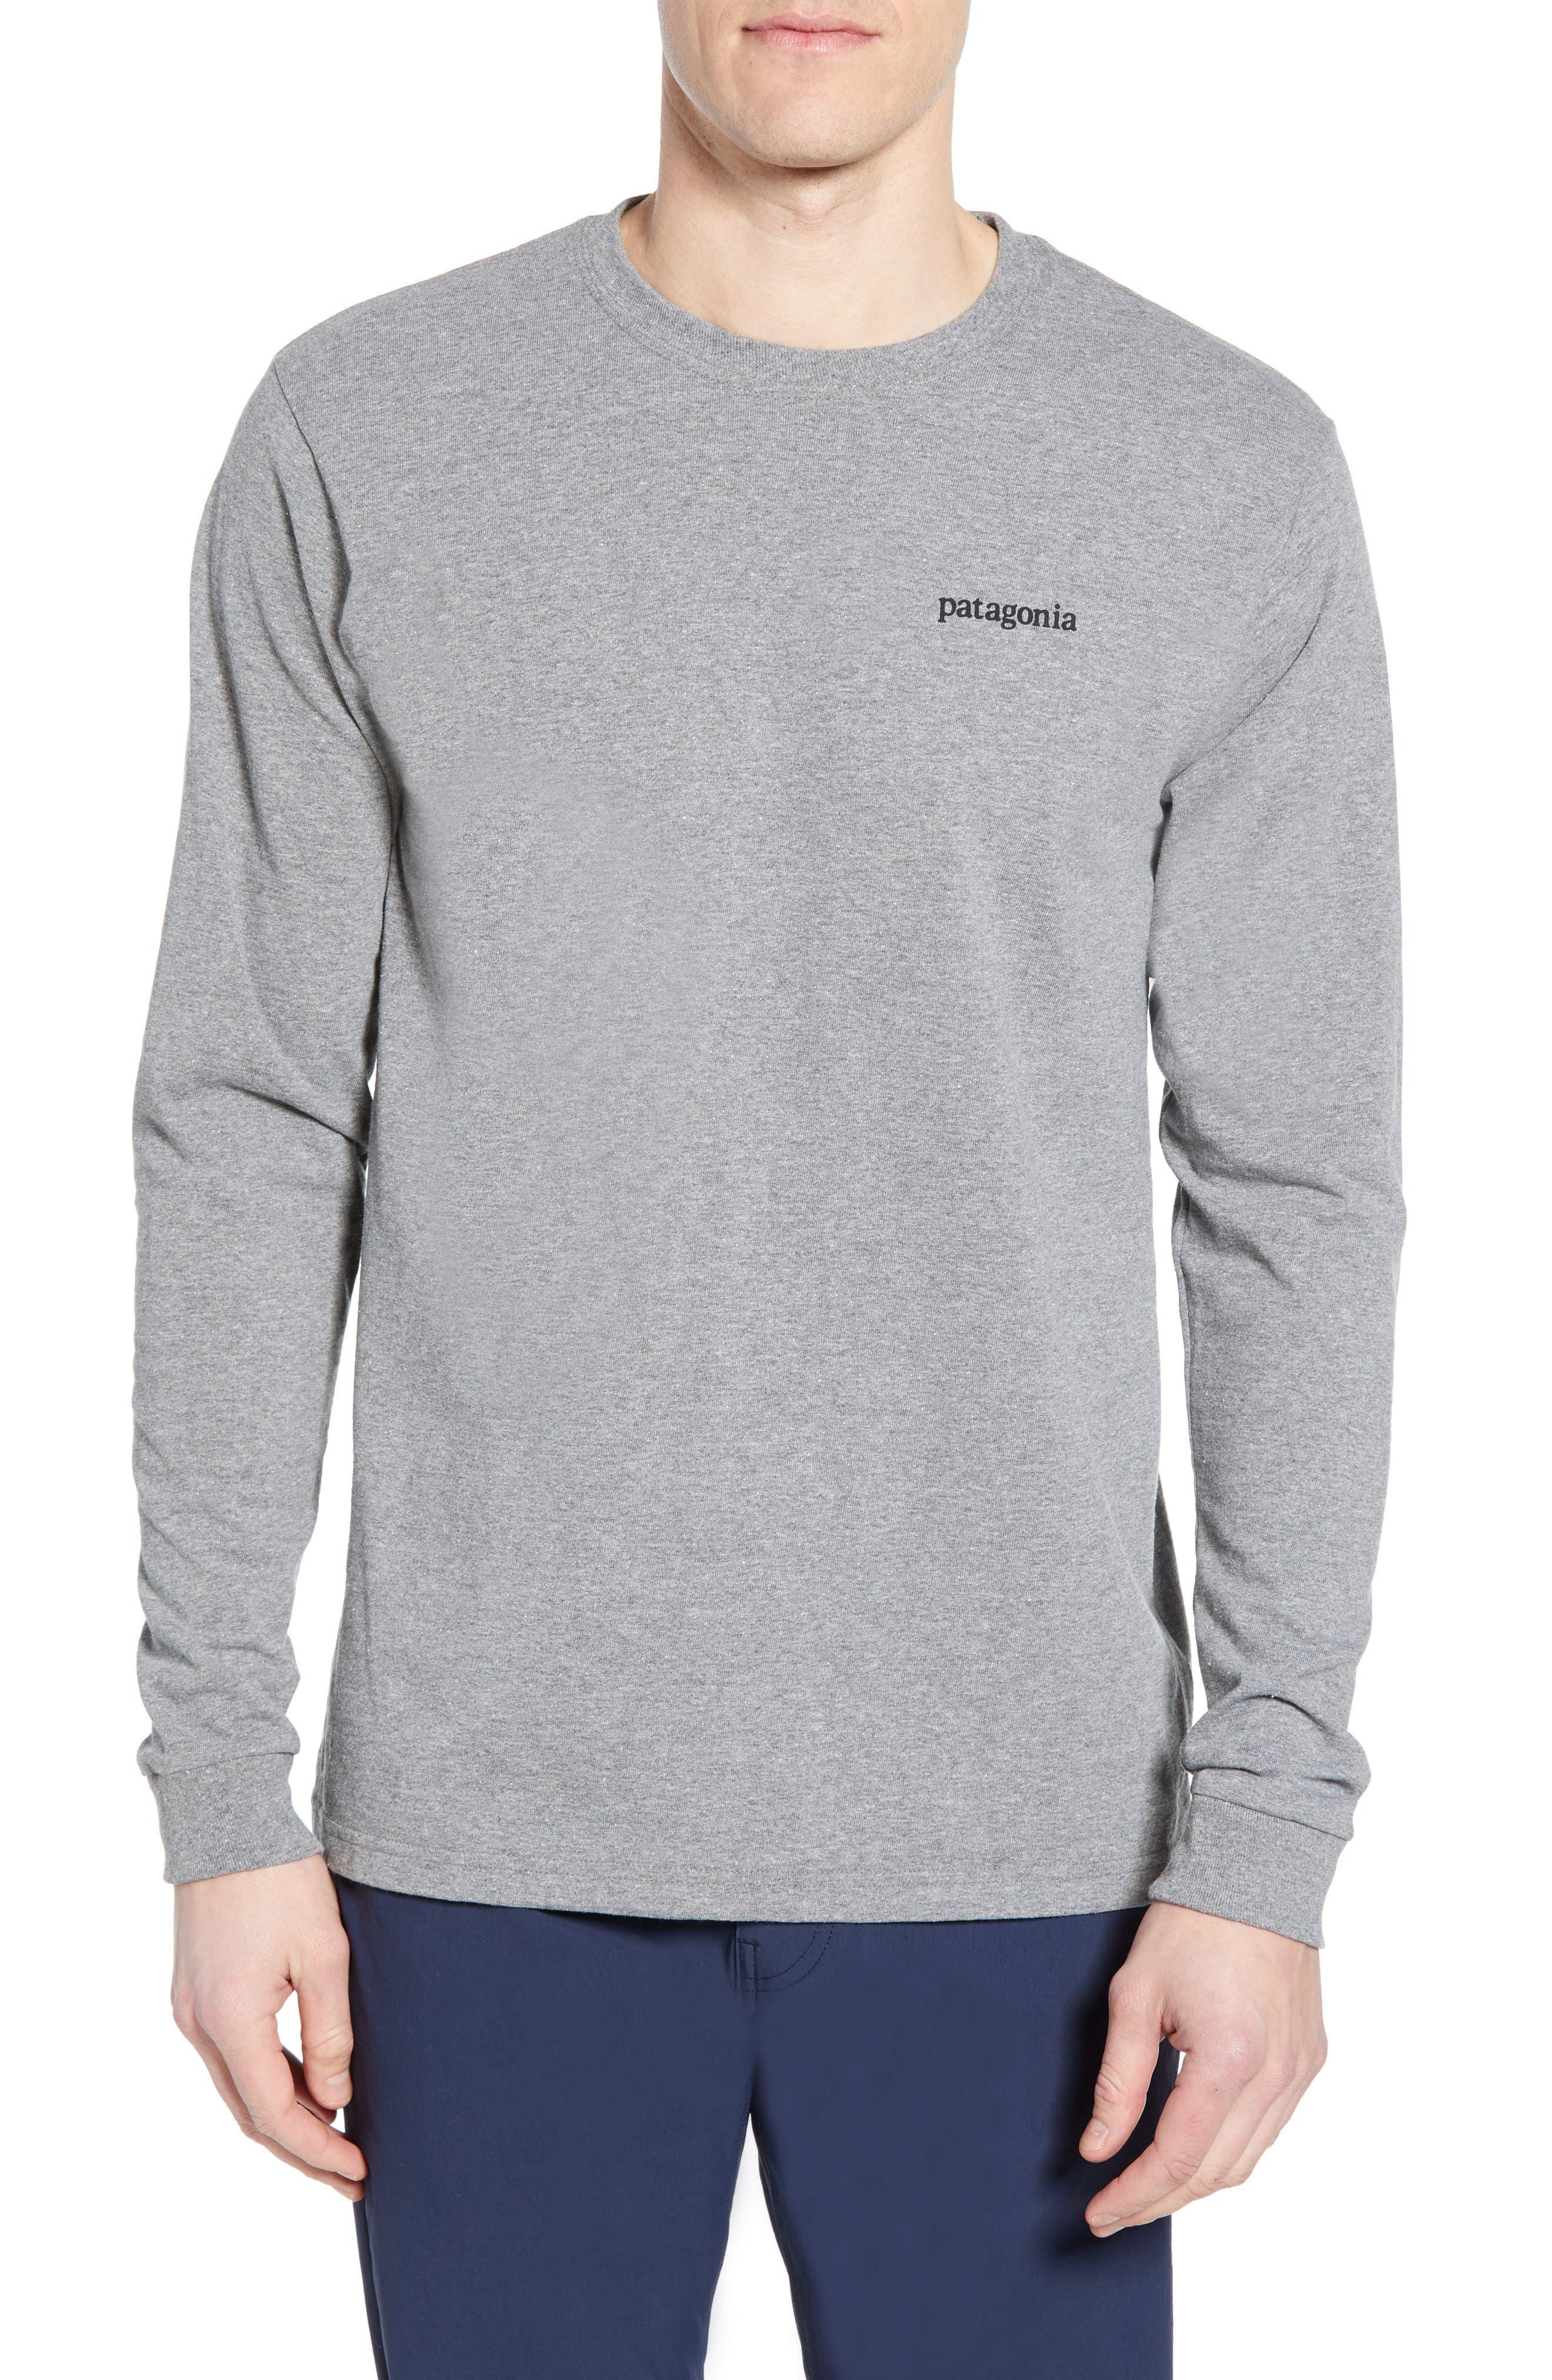 Patagonia Line Logo Long Sleeve Responsibili-Tee T-Shirt, Grey